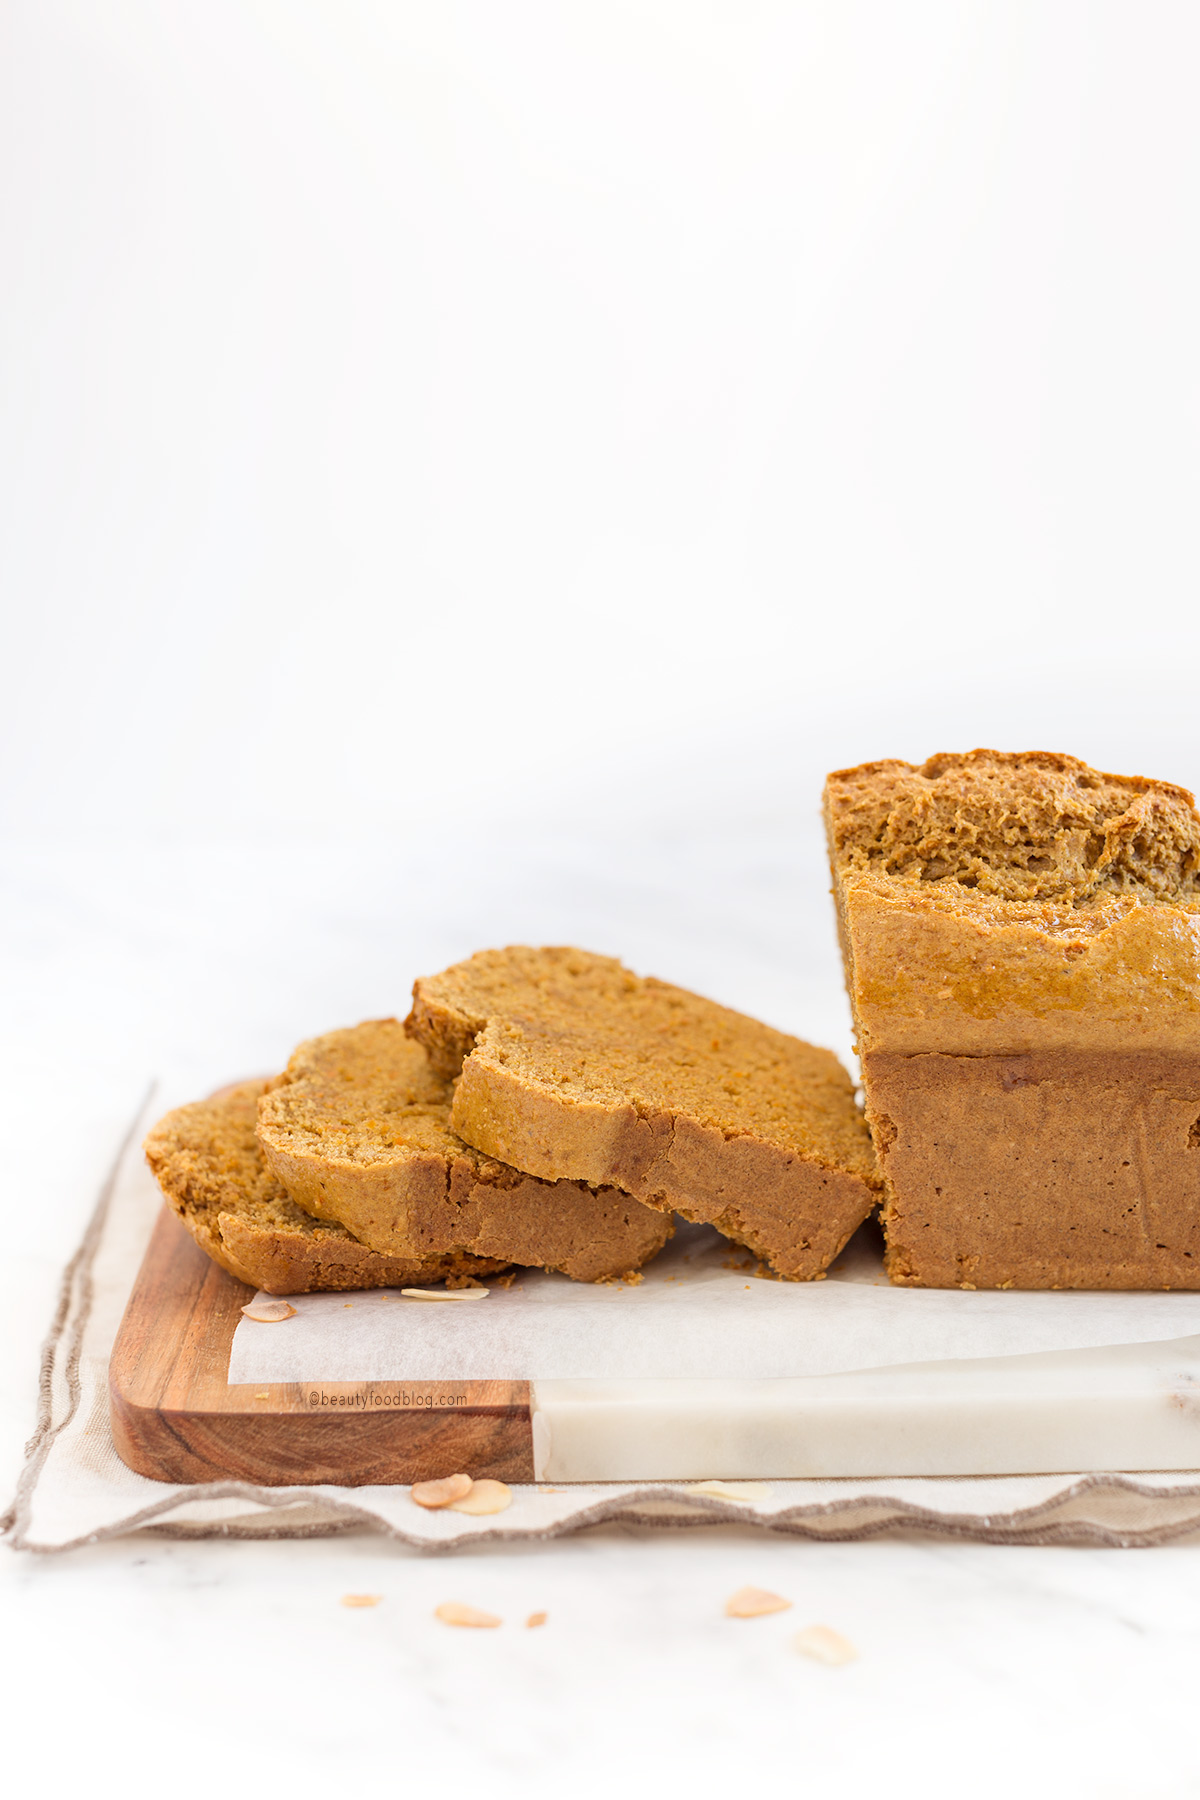 wholemeal spelt #VEGAN #CARROT #ALMOND LOAF CAKE - PLUMCAKE VEGAN CAROTE e MANDORLE con ARANCIA farina di farro integrale e dolcificante naturale / www.beautyfoodblog.com